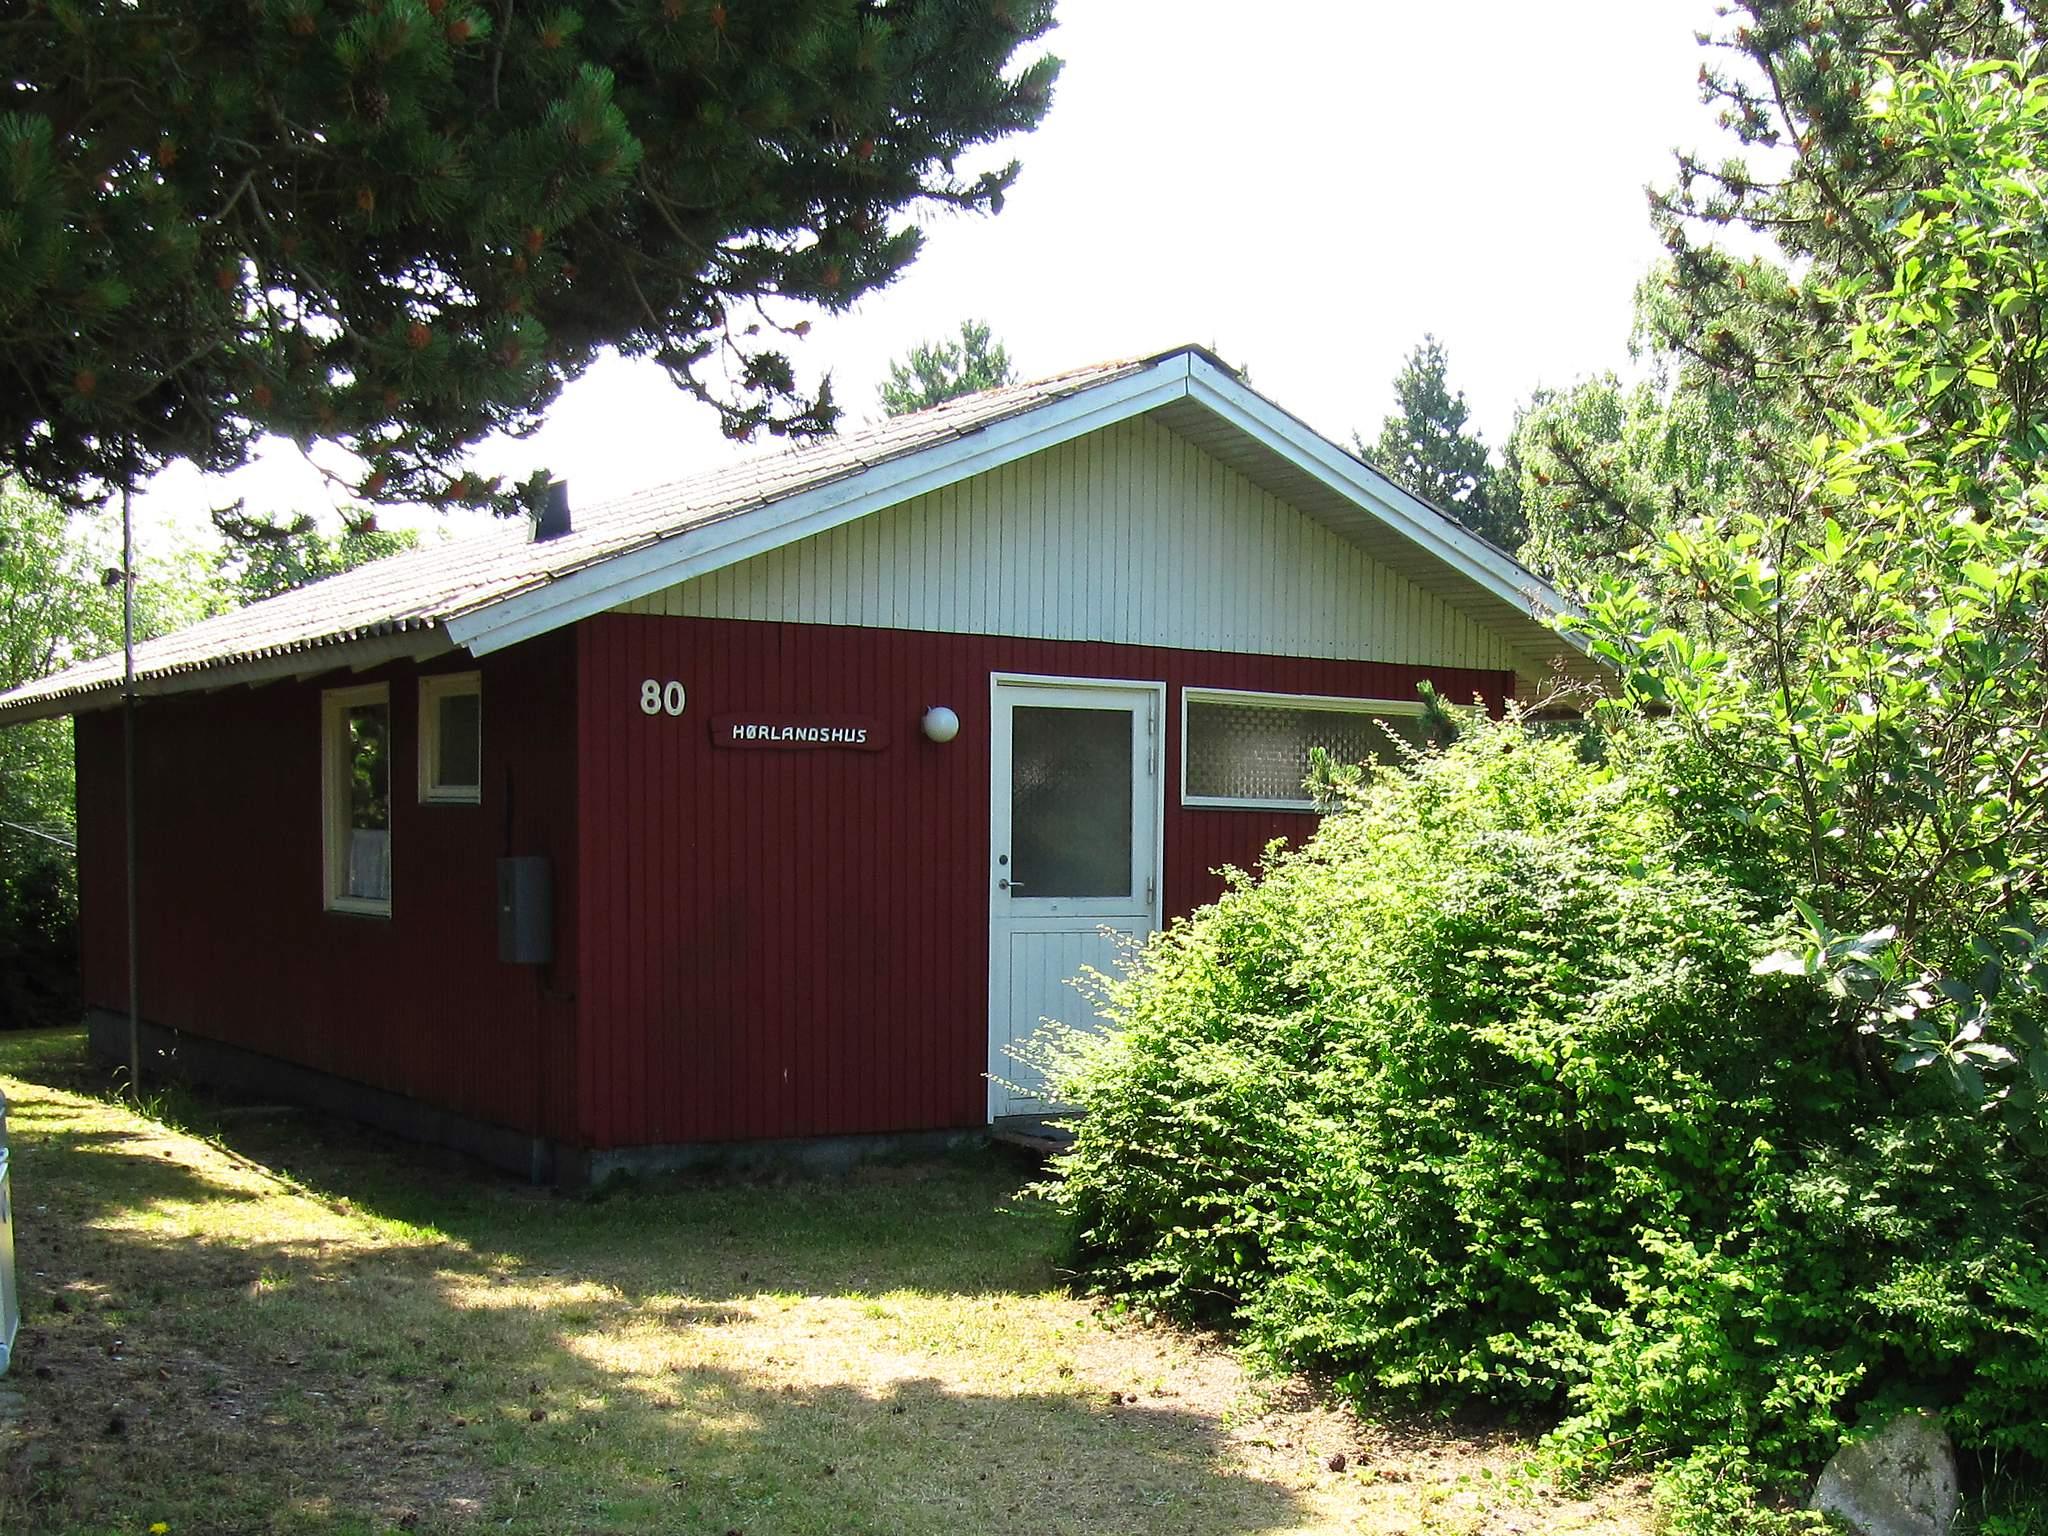 Maison de vacances Kramnitze (87282), Kramnitse, , Lolland, Danemark, image 6